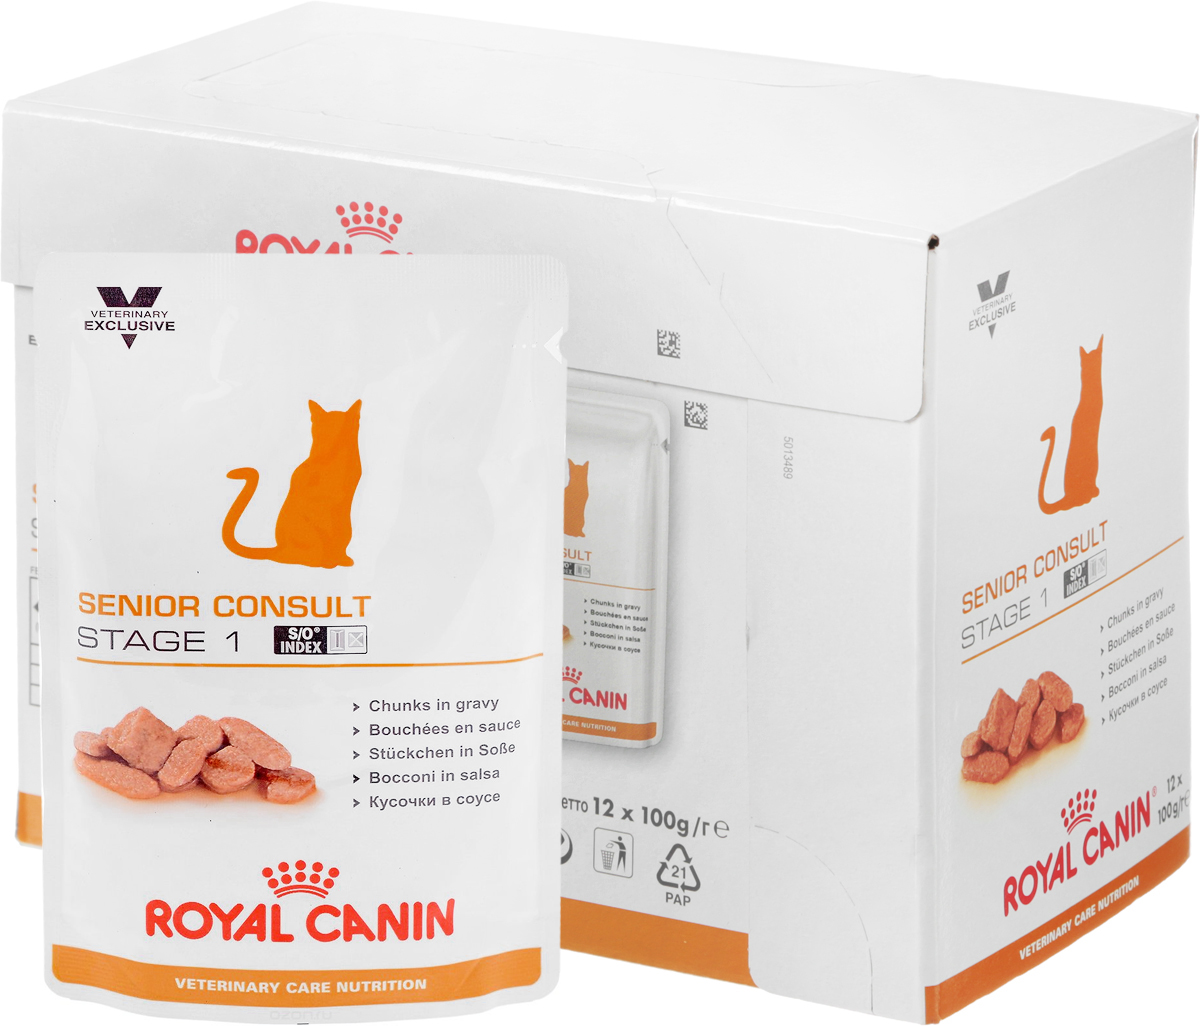 Консервы Royal Canin Senior Consult Stage 1 для кошек старше 7 лет, 100 г, 12 шт консервы royal canin senior consult stage 1 для кошек старше 7 лет 100 г 12 шт